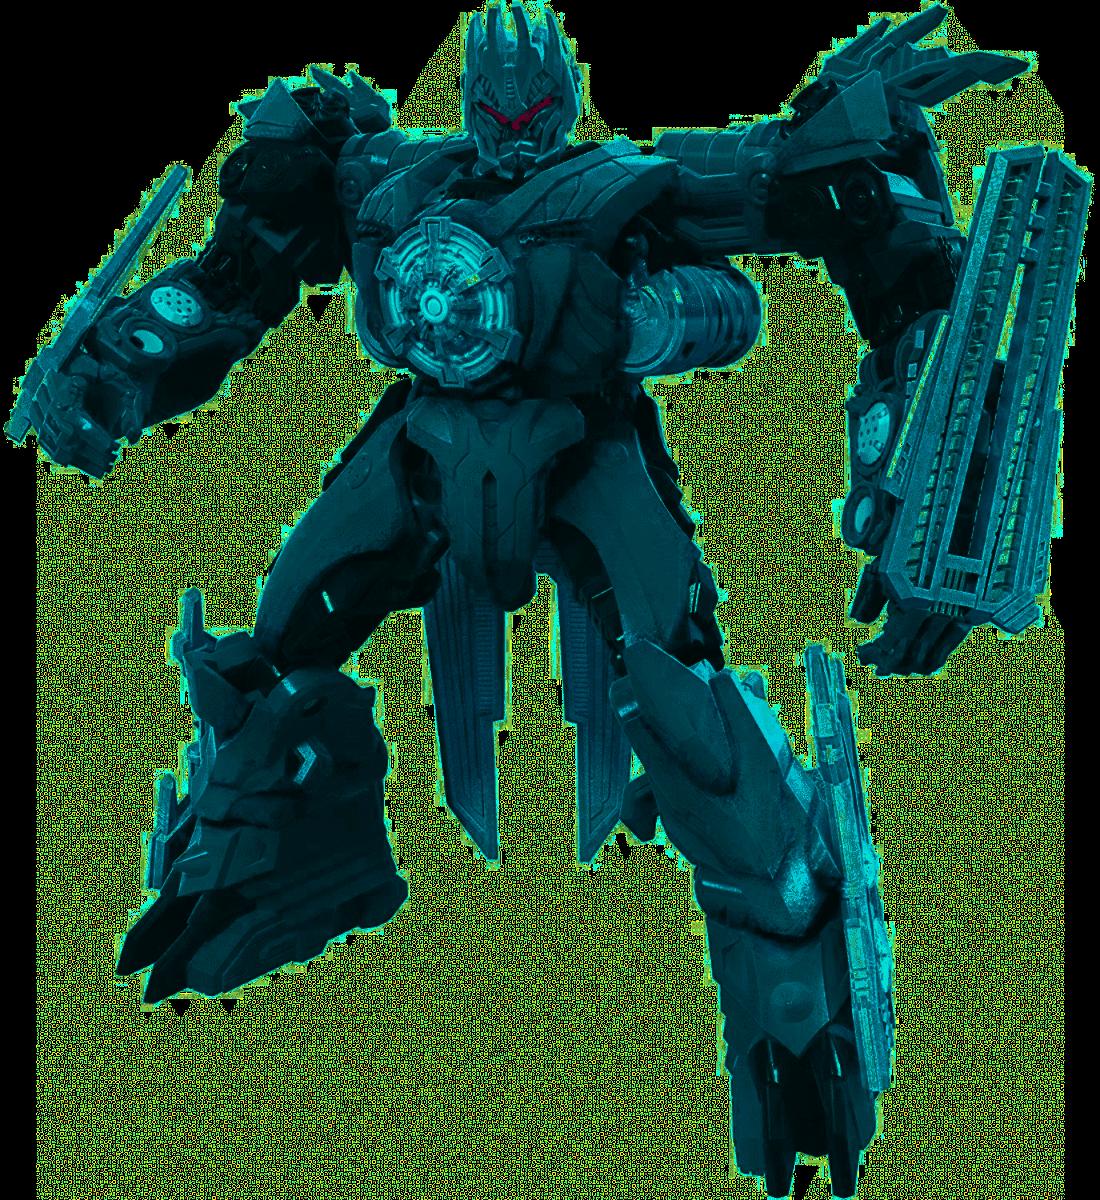 Transformers Toys Studio Series 62 Deluxe Transformers: Revenge Of The Fallen Film Soundwave